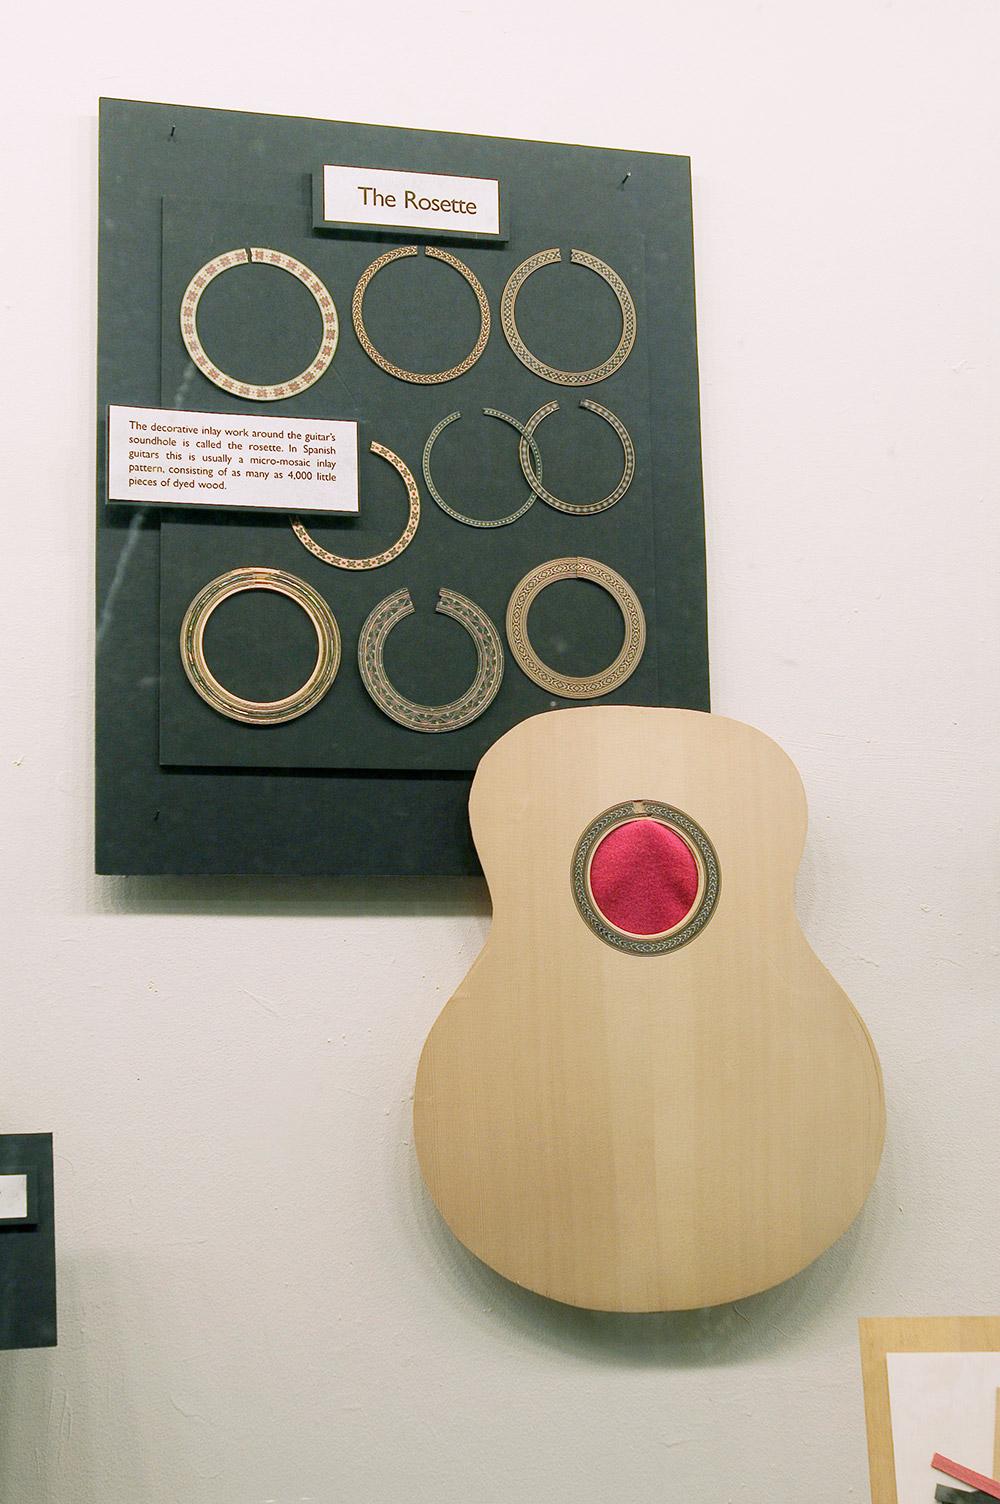 The soundhole rosette